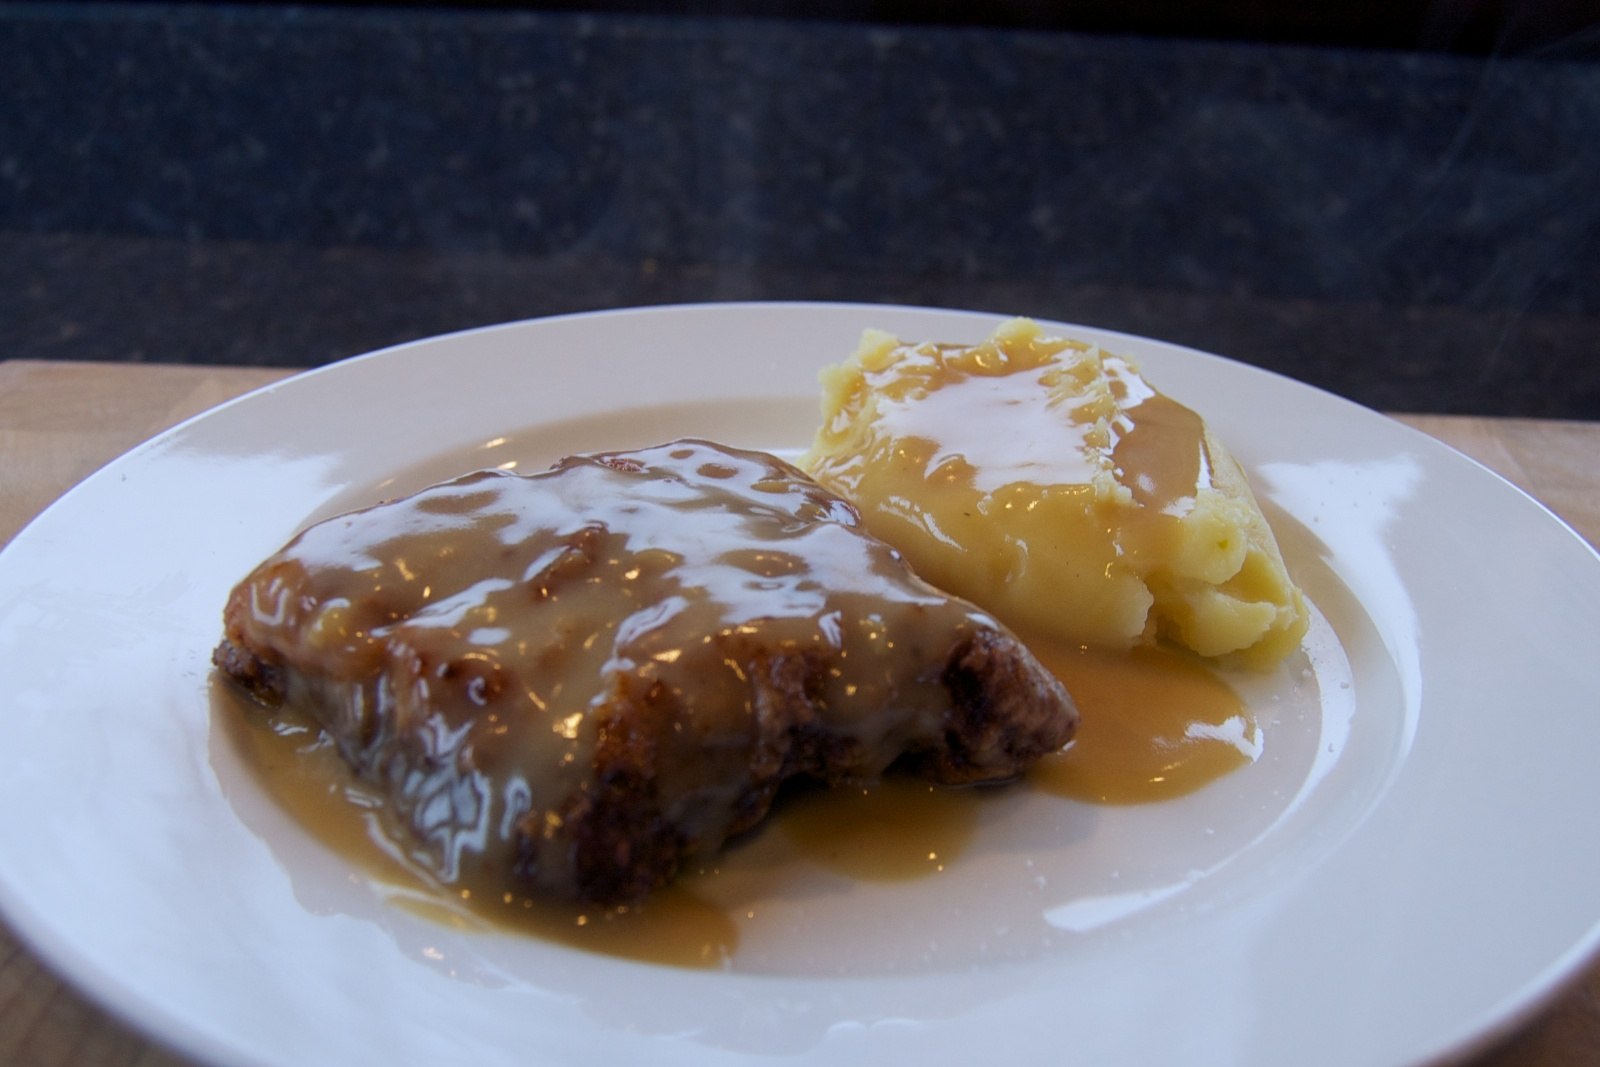 http://blog.rickk.com/food/2012/11/02/ate.2012.11.02.d.jpg